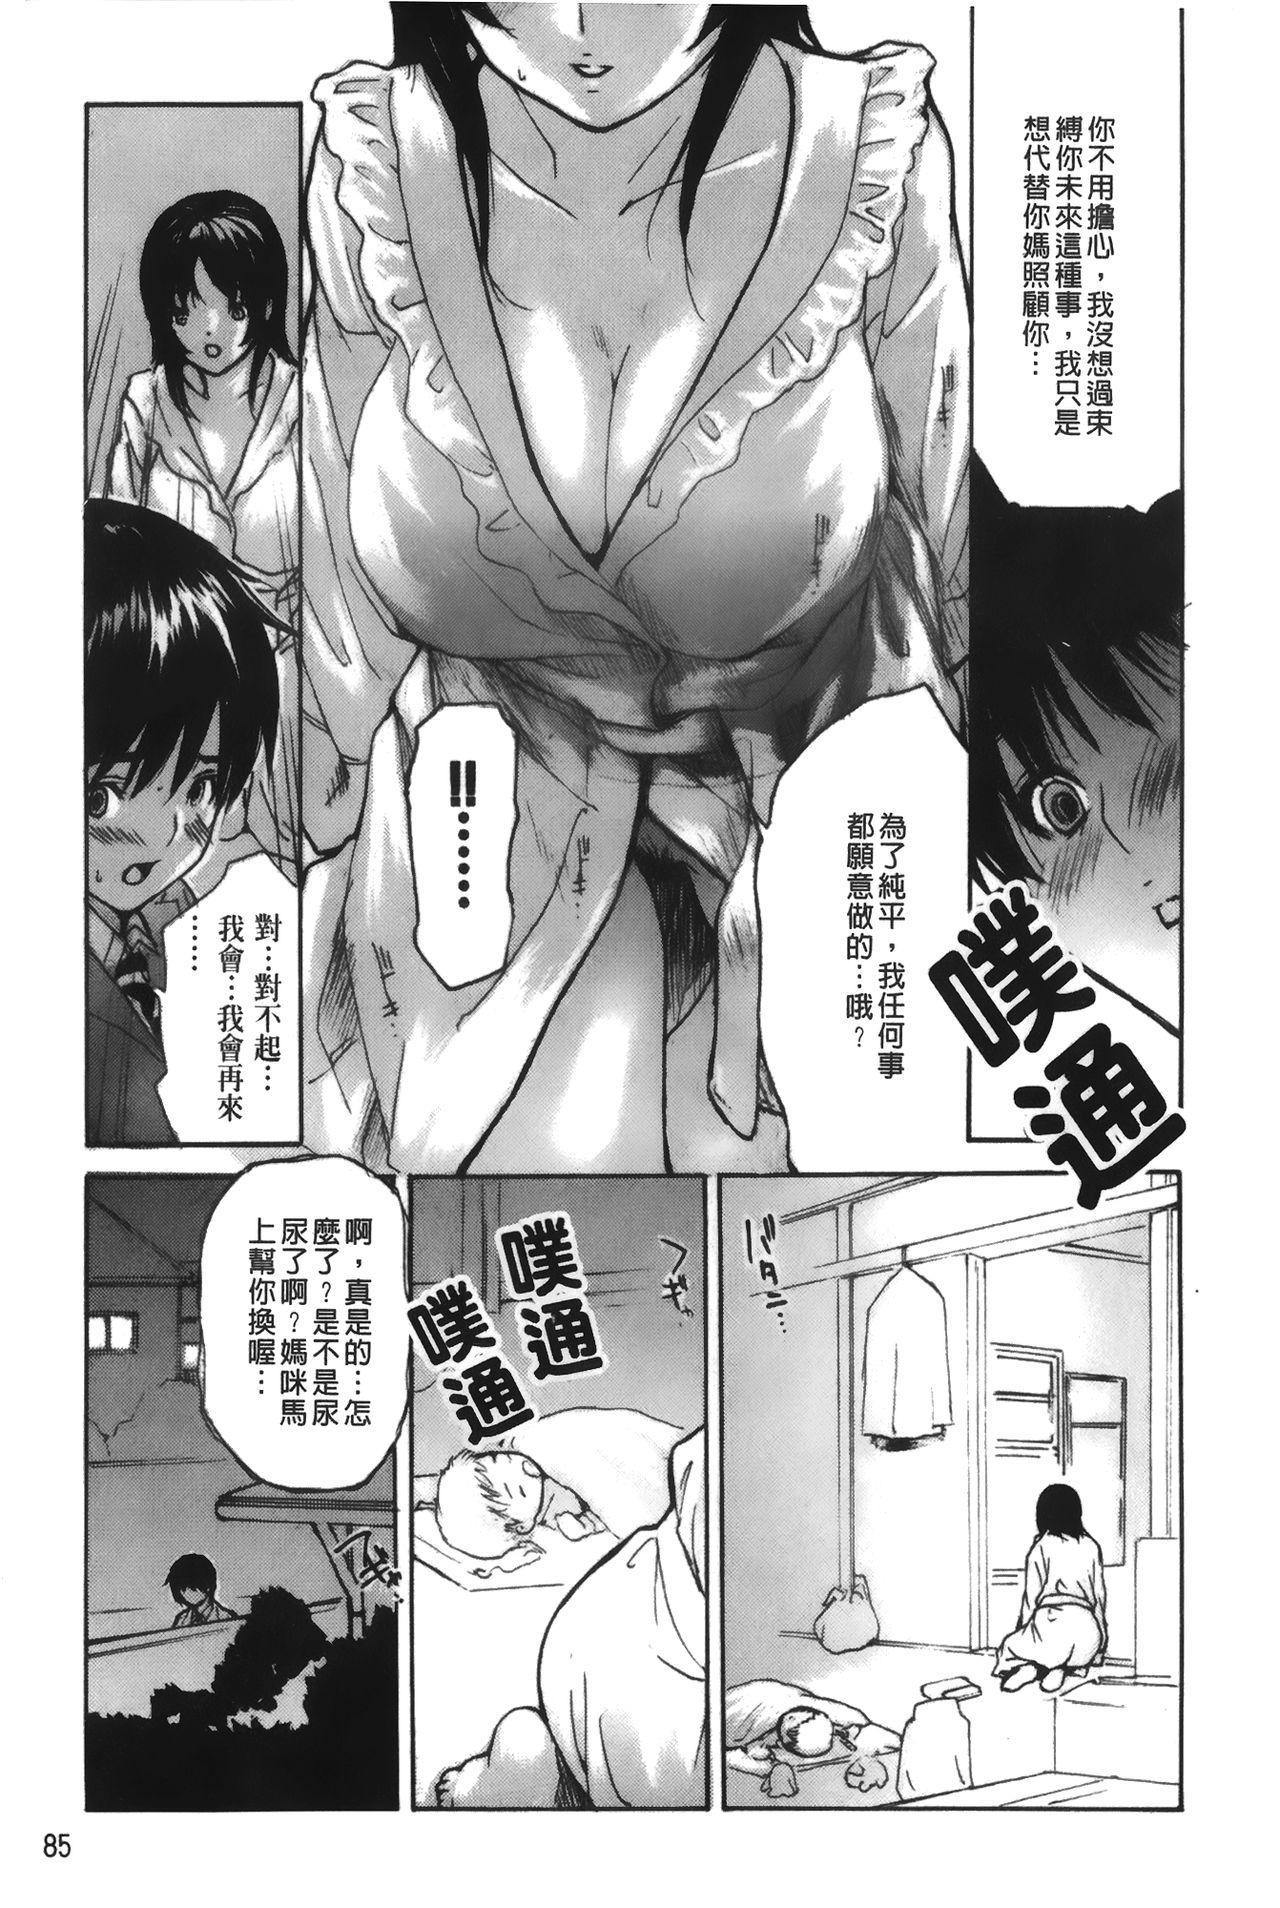 Tonari no Minano Sensei 4 | 隔壁的美奈乃老師 4 86